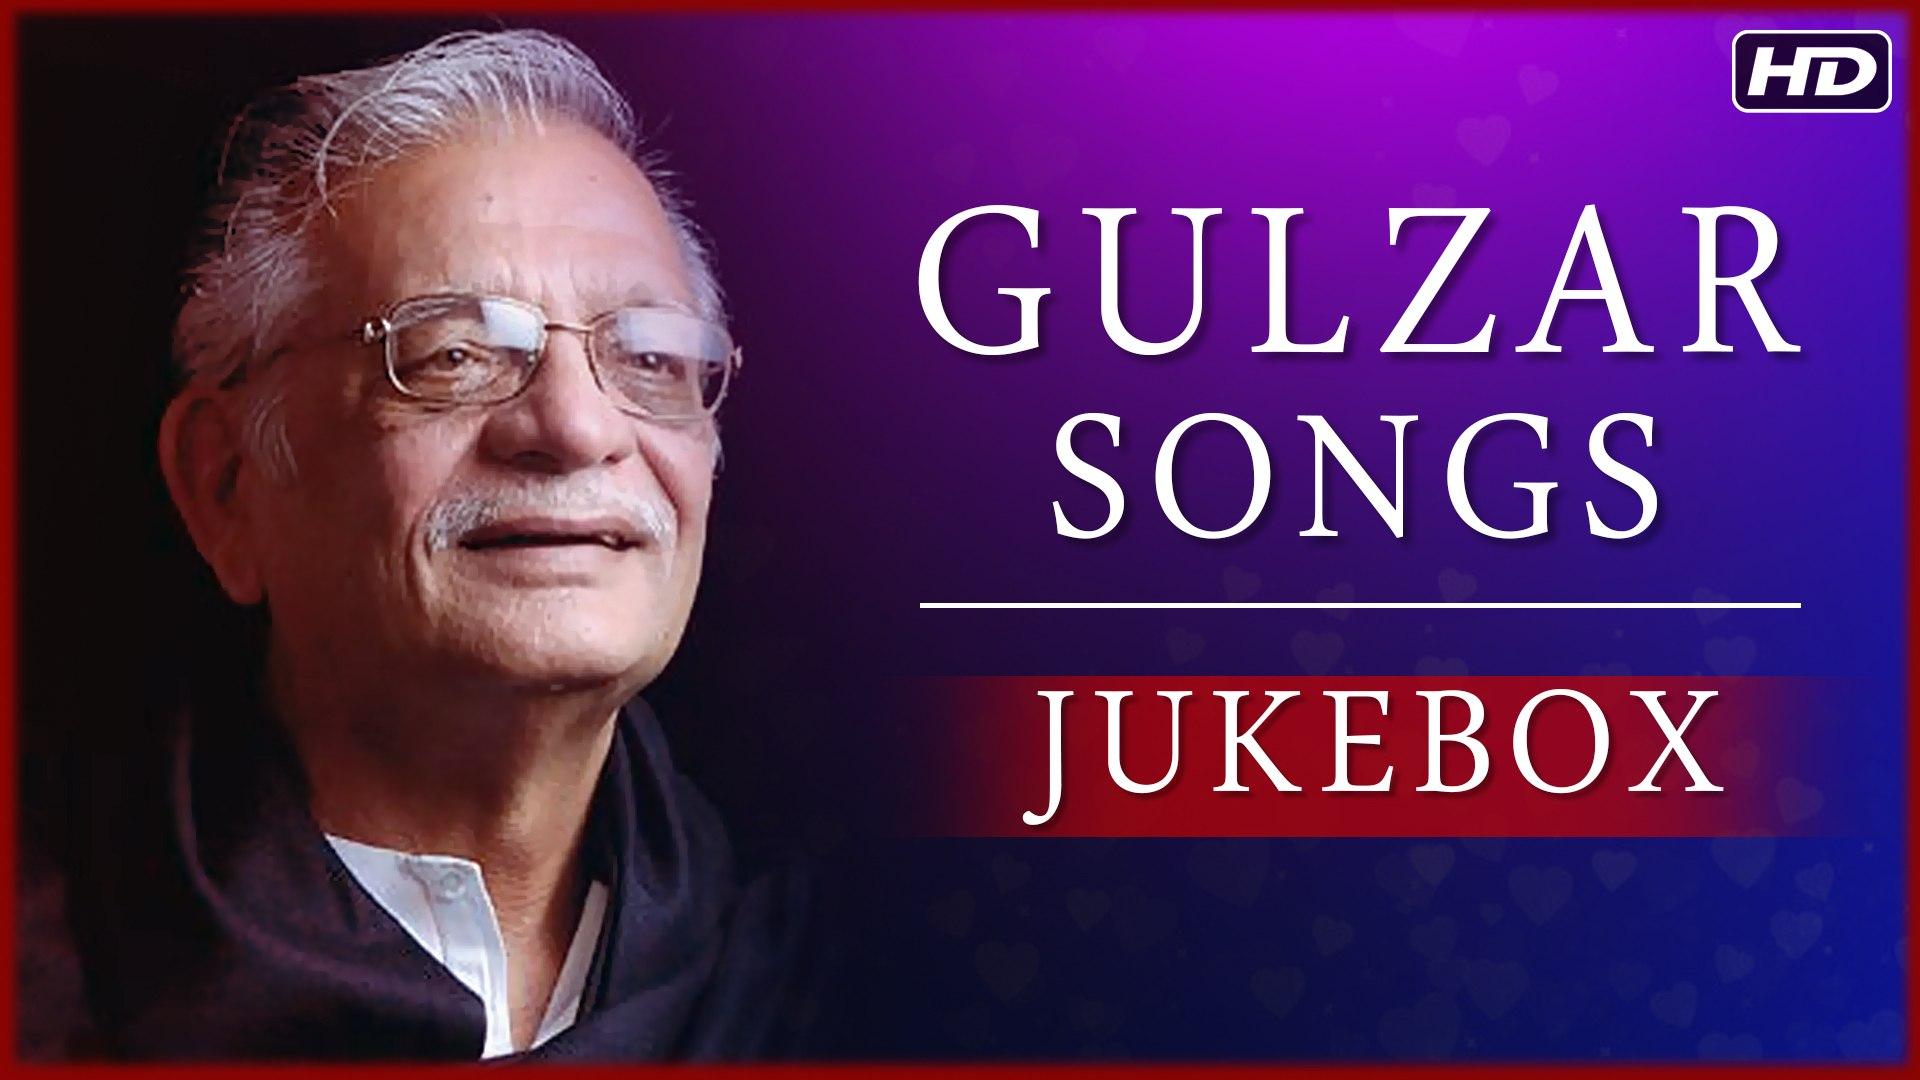 गुलज़ार के गाने   Gulzar Sahab Songs   Gulzar Hits   Gulzar Ke Gaane   Old Bollywood Songs Jukebox